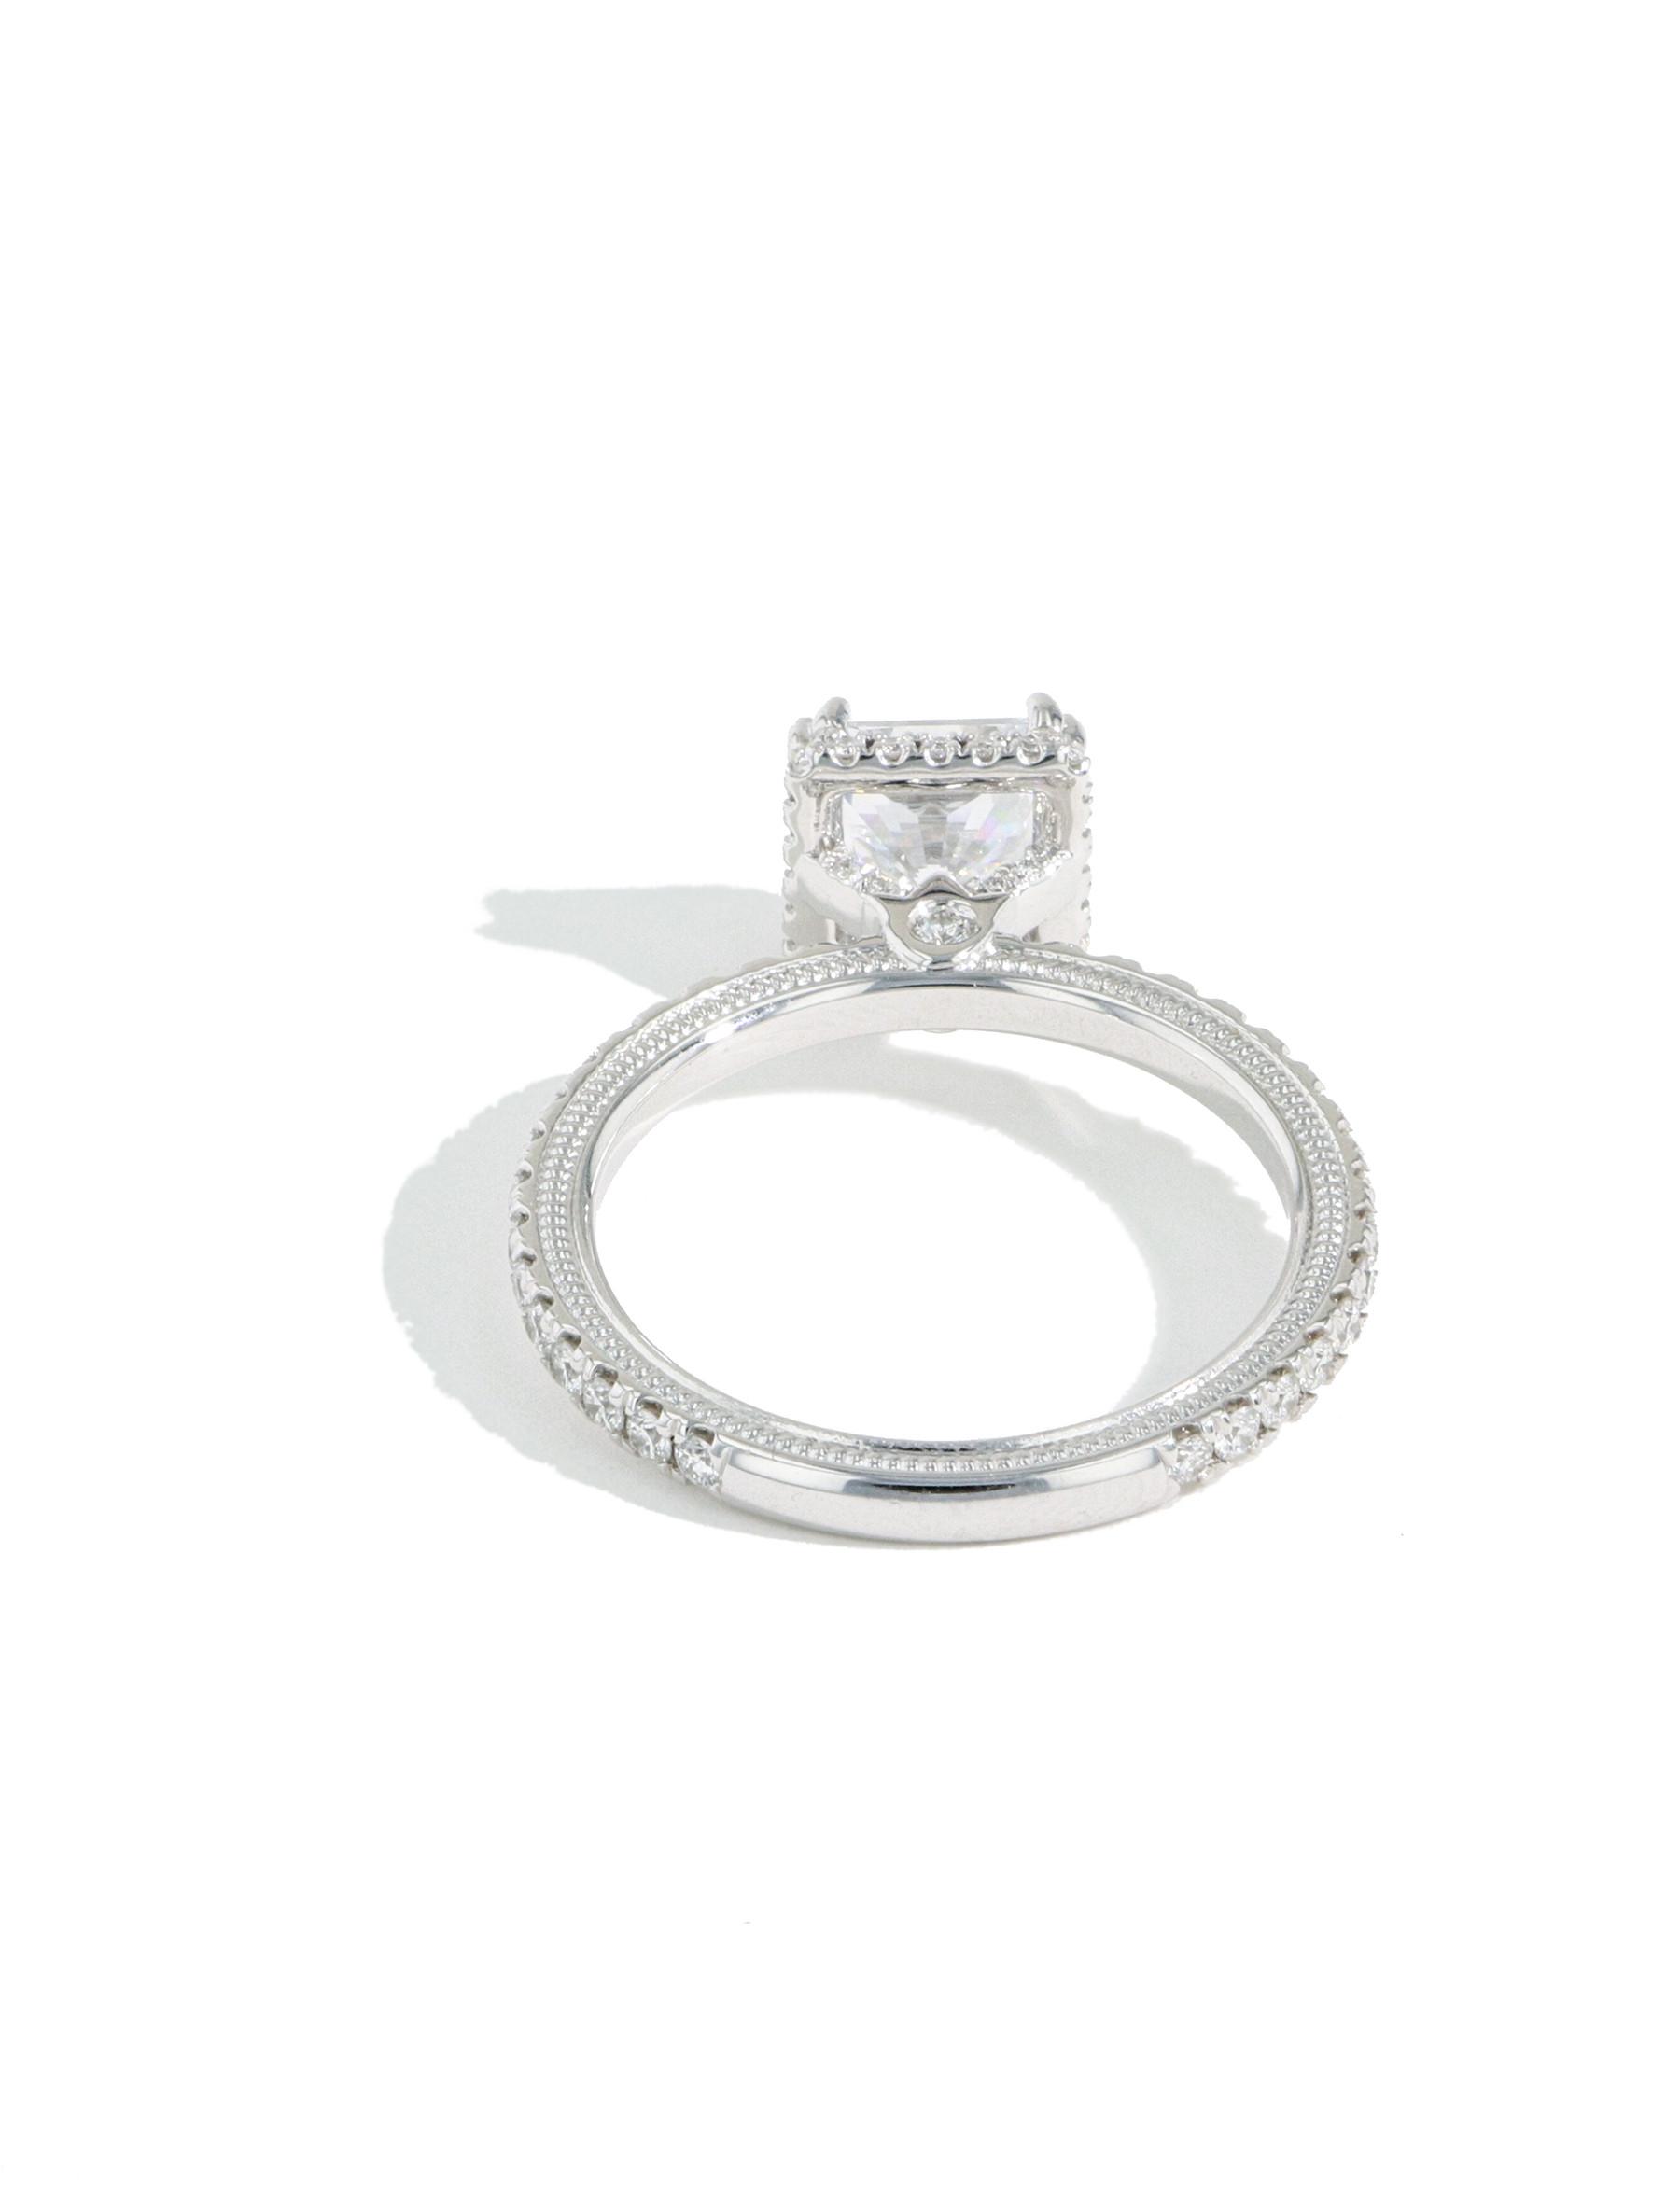 Verragio Tradition Hidden Halo Princess Diamond Engagement Ring Setting back view